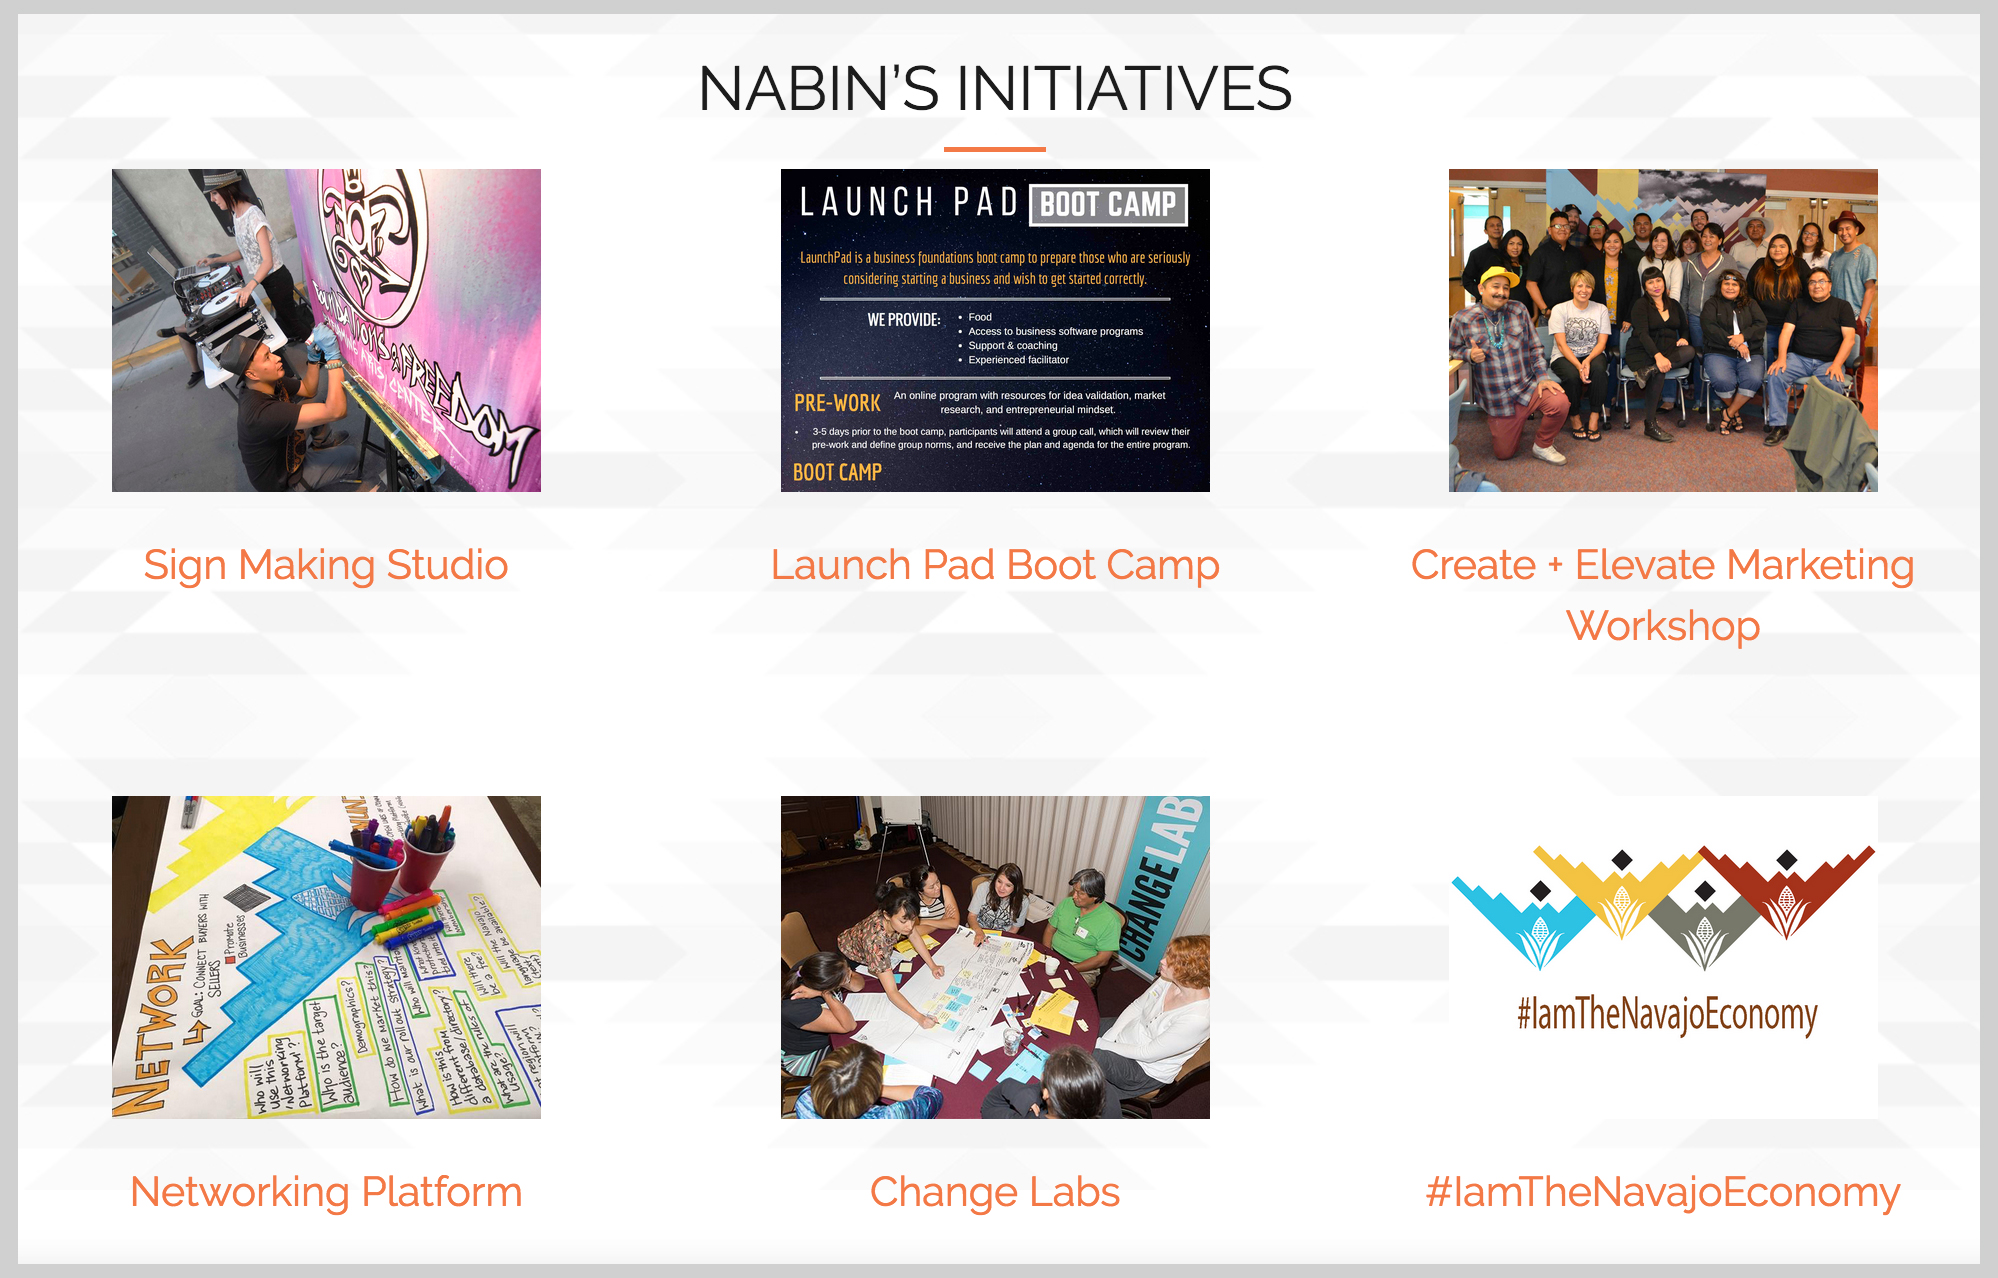 NABIN-Initiatives-high-res.jpg